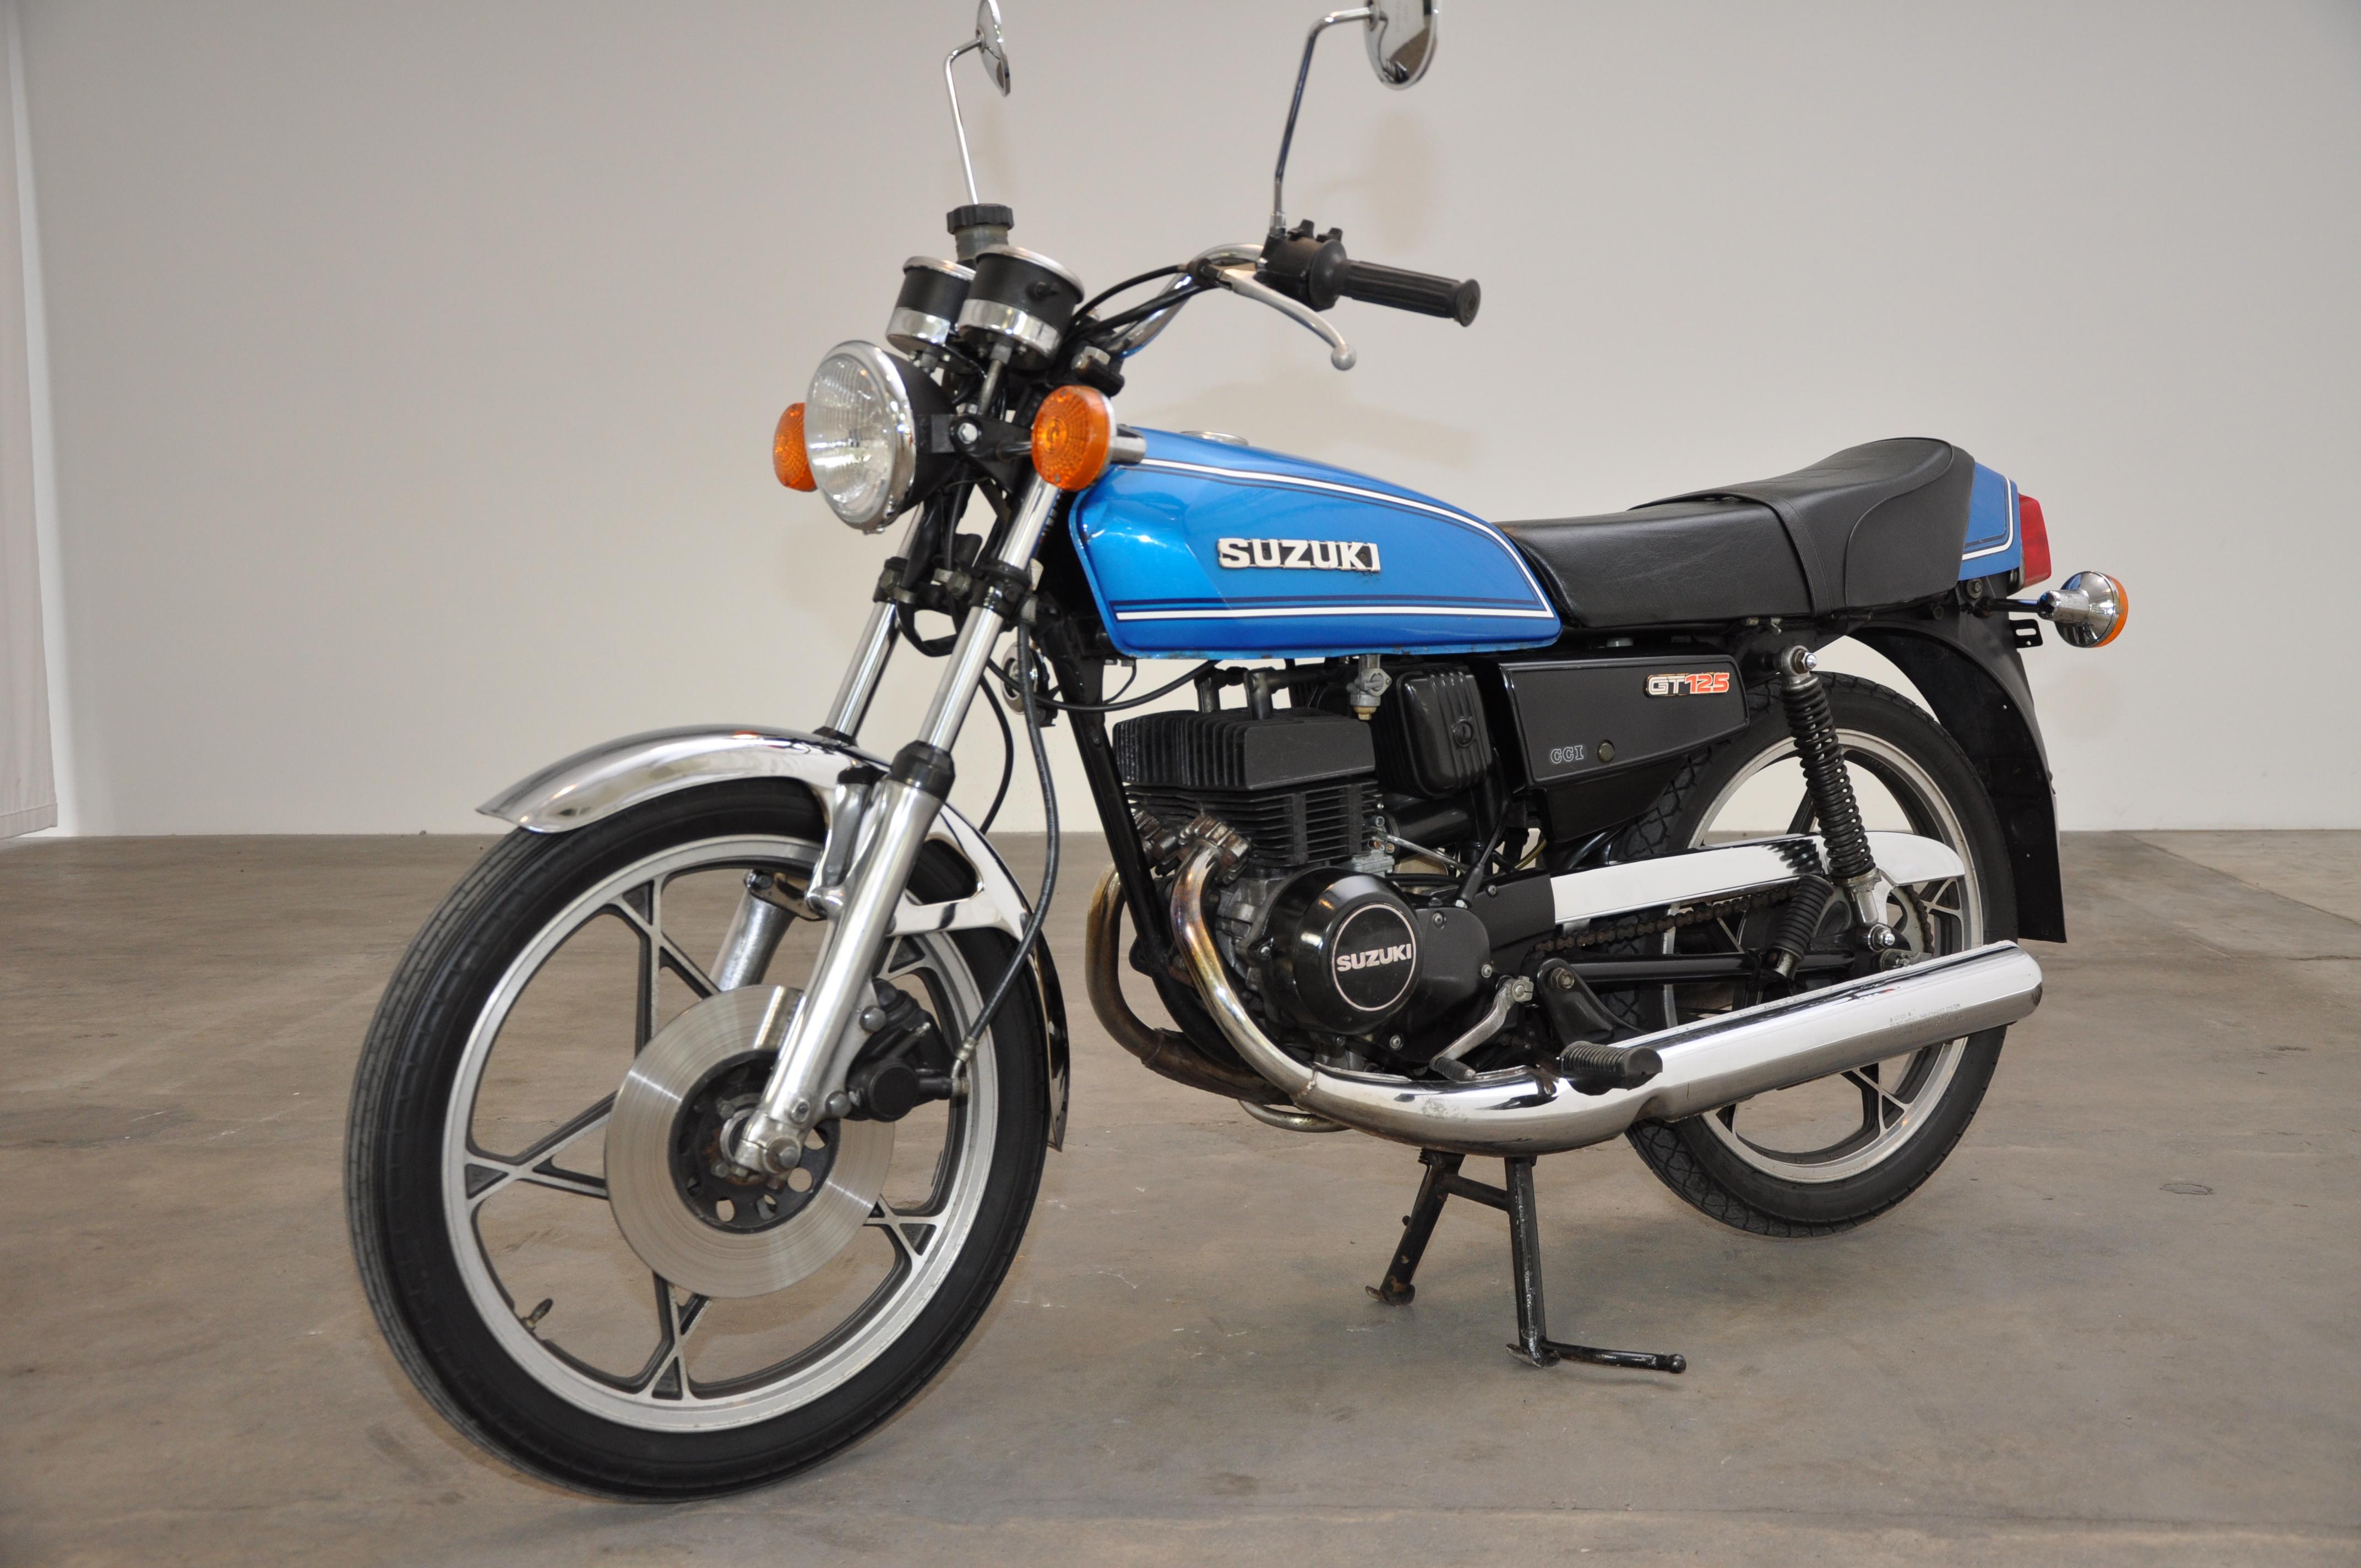 1979 Suzuki GT 125 | CLASSIC MOTOR SALES